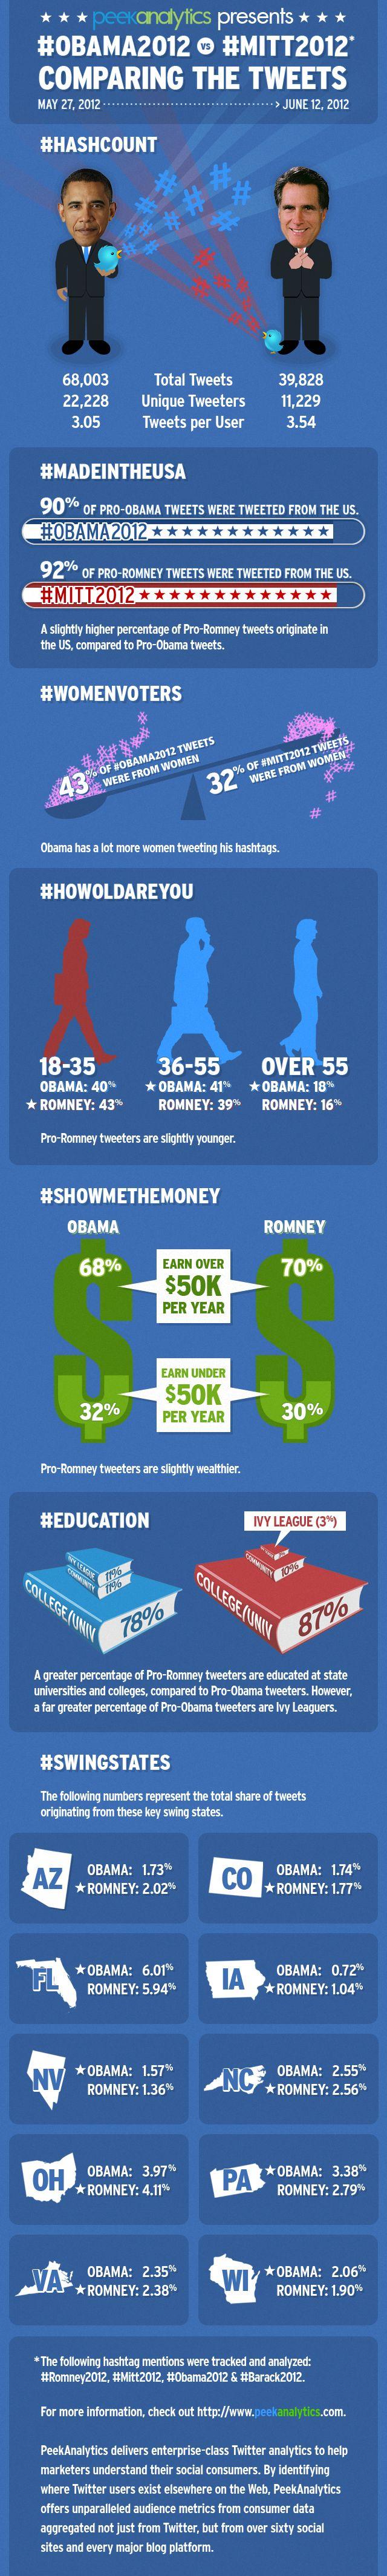 Obama2012 vs Mitt2012: Comparing the Tweets